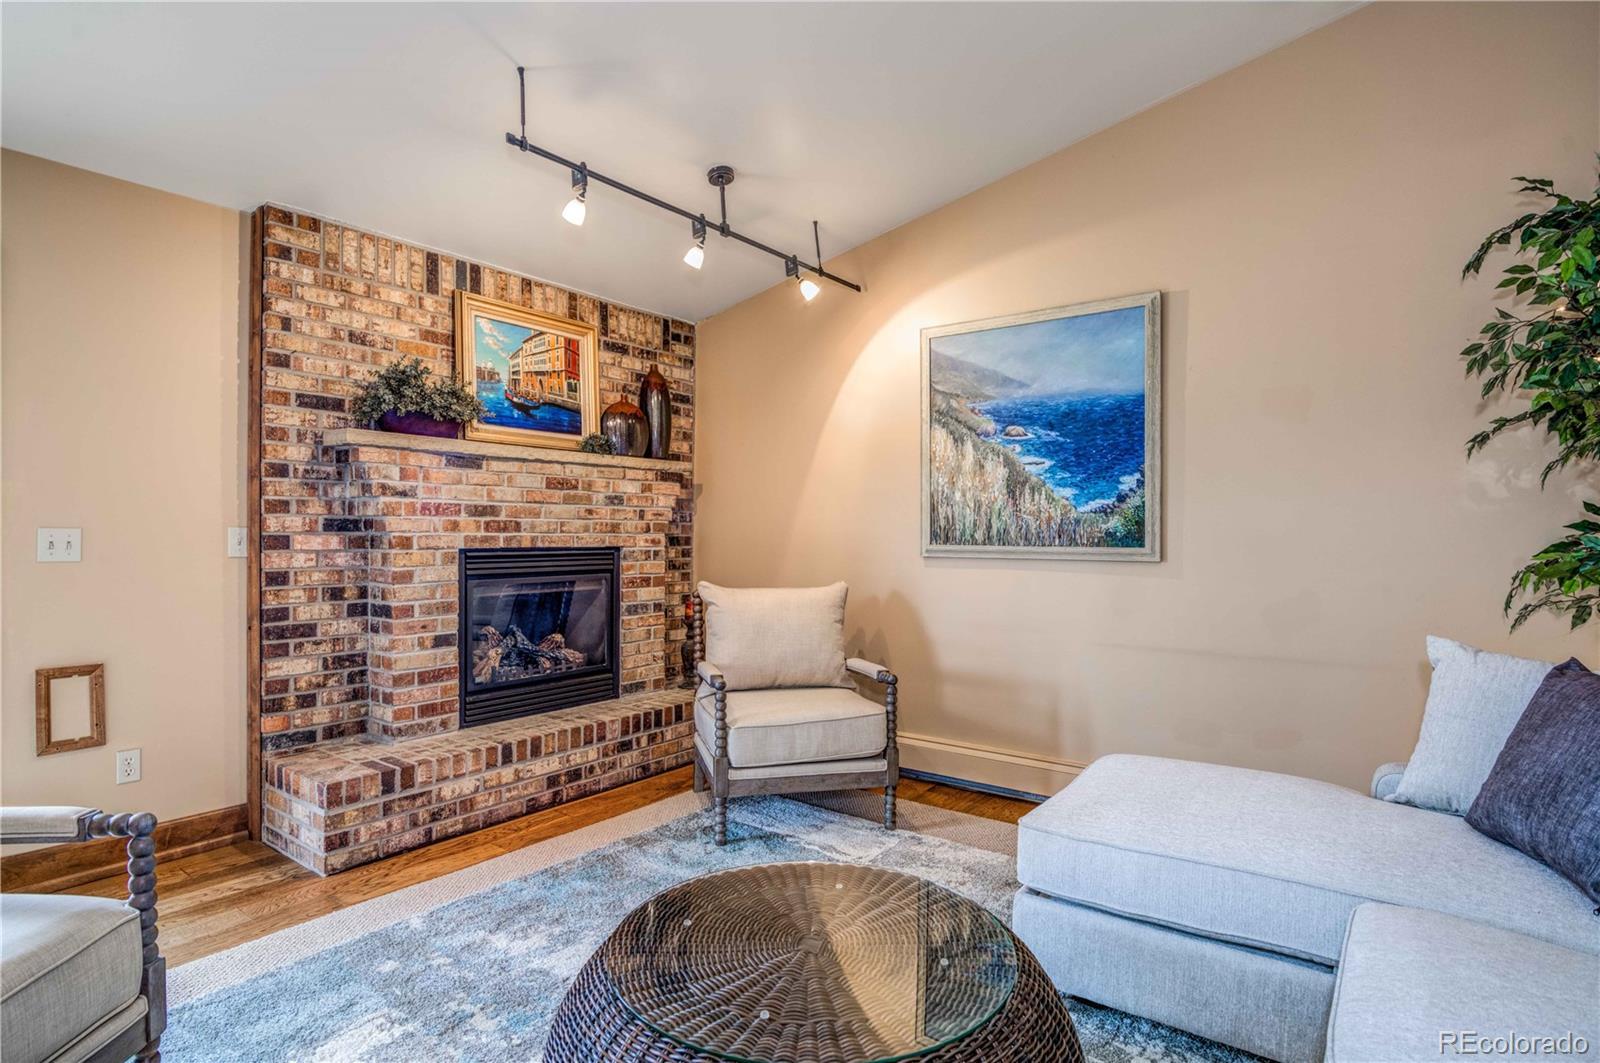 MLS# 5539974 - 7 - 5505 Saddle Rock Place, Colorado Springs, CO 80918